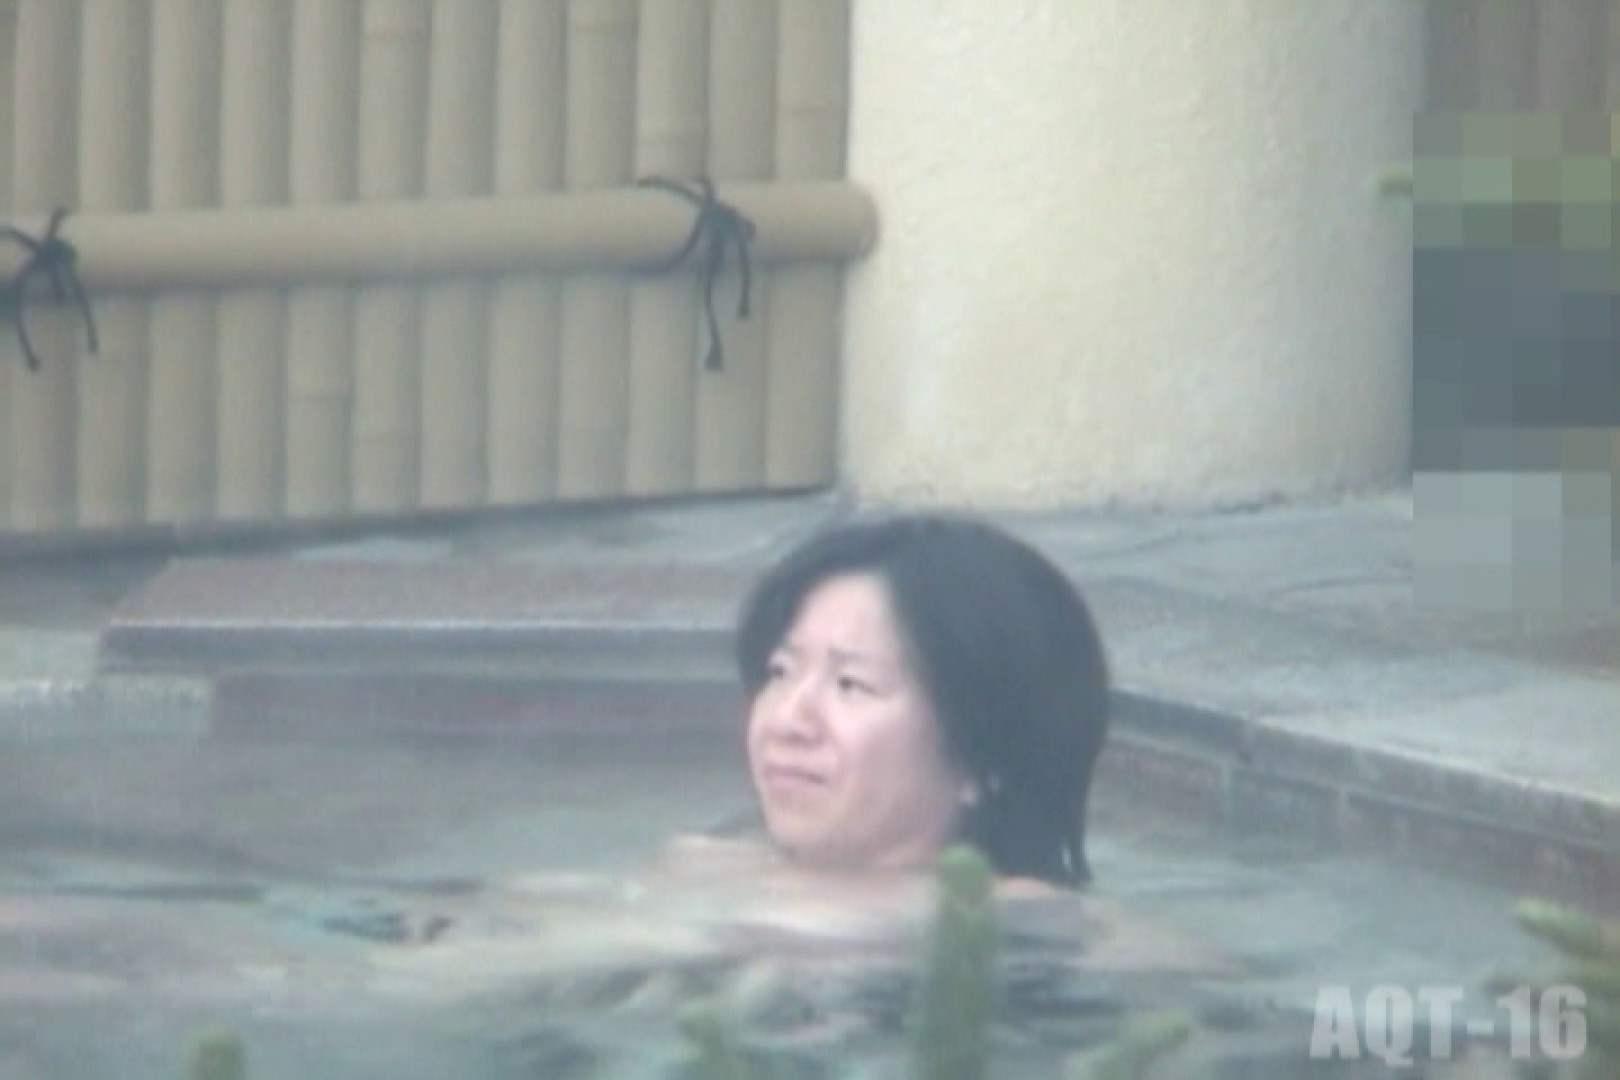 Aquaな露天風呂Vol.841 OLセックス 盗撮セックス無修正動画無料 56画像 47